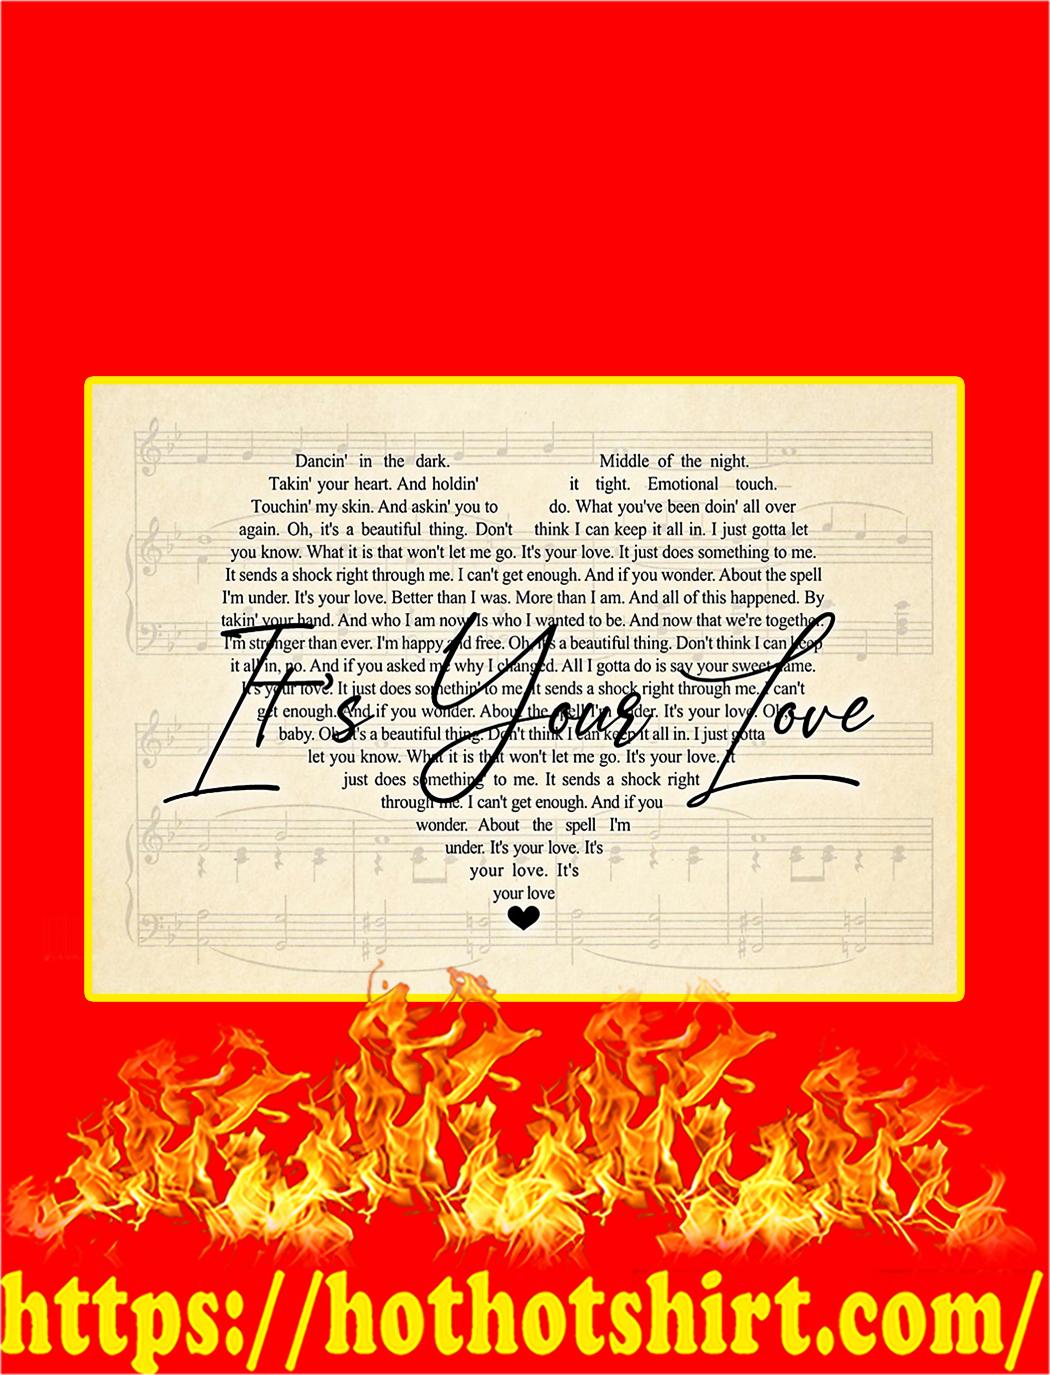 It's Your Love Lyrics PosterIt's Your Love Lyrics Poster